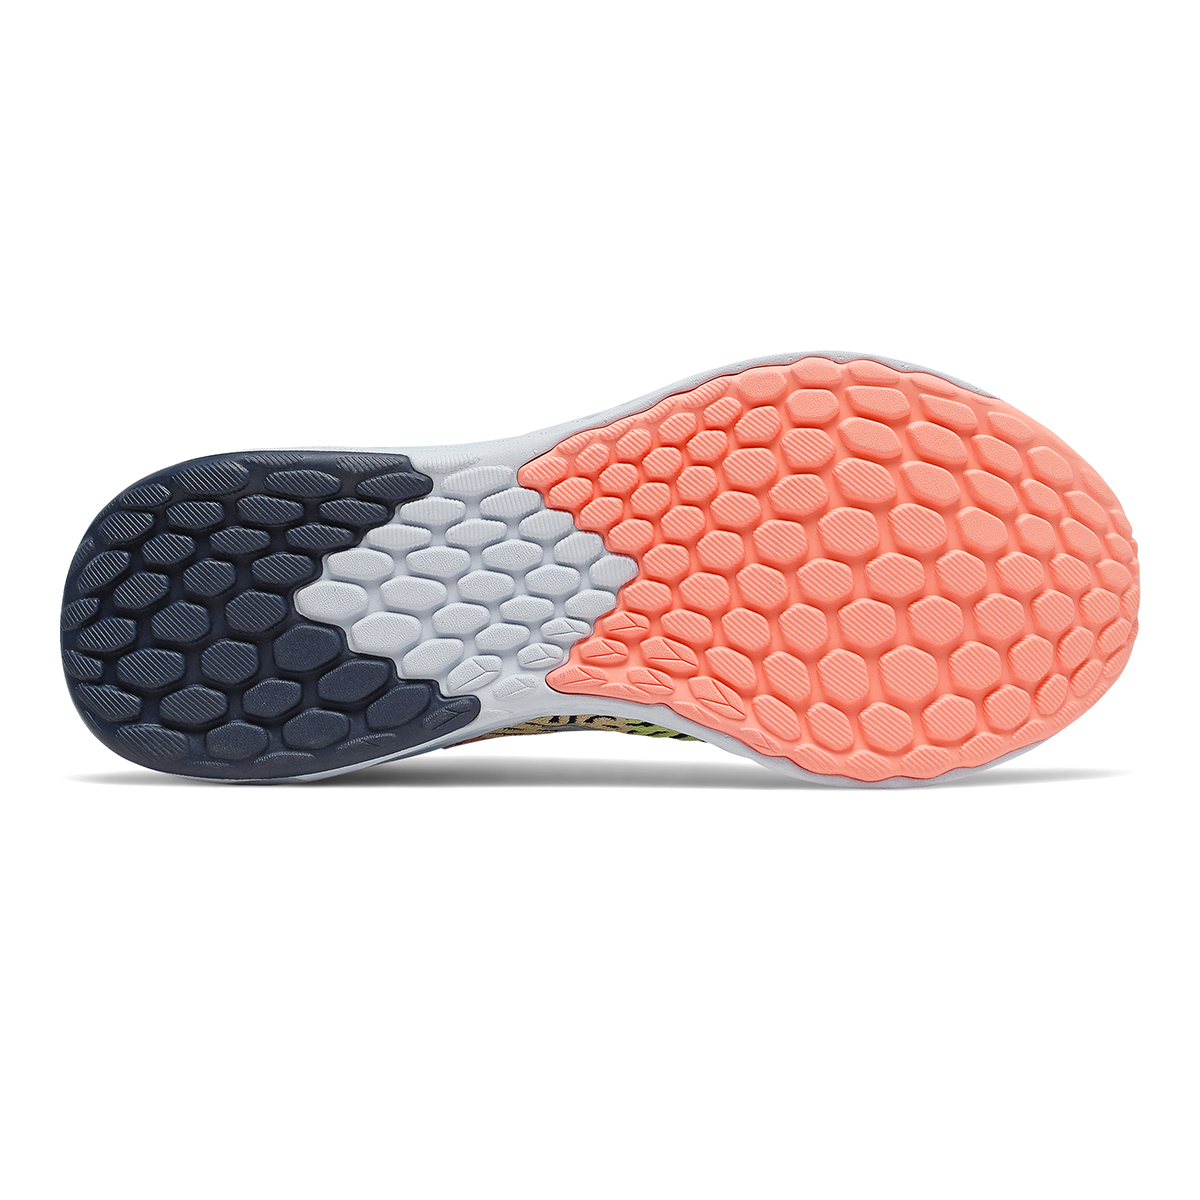 Women's New Balance Tempo Running Shoe - Color: Natural Indigo - Size: 5 - Width: Regular, Natural Indigo, large, image 4